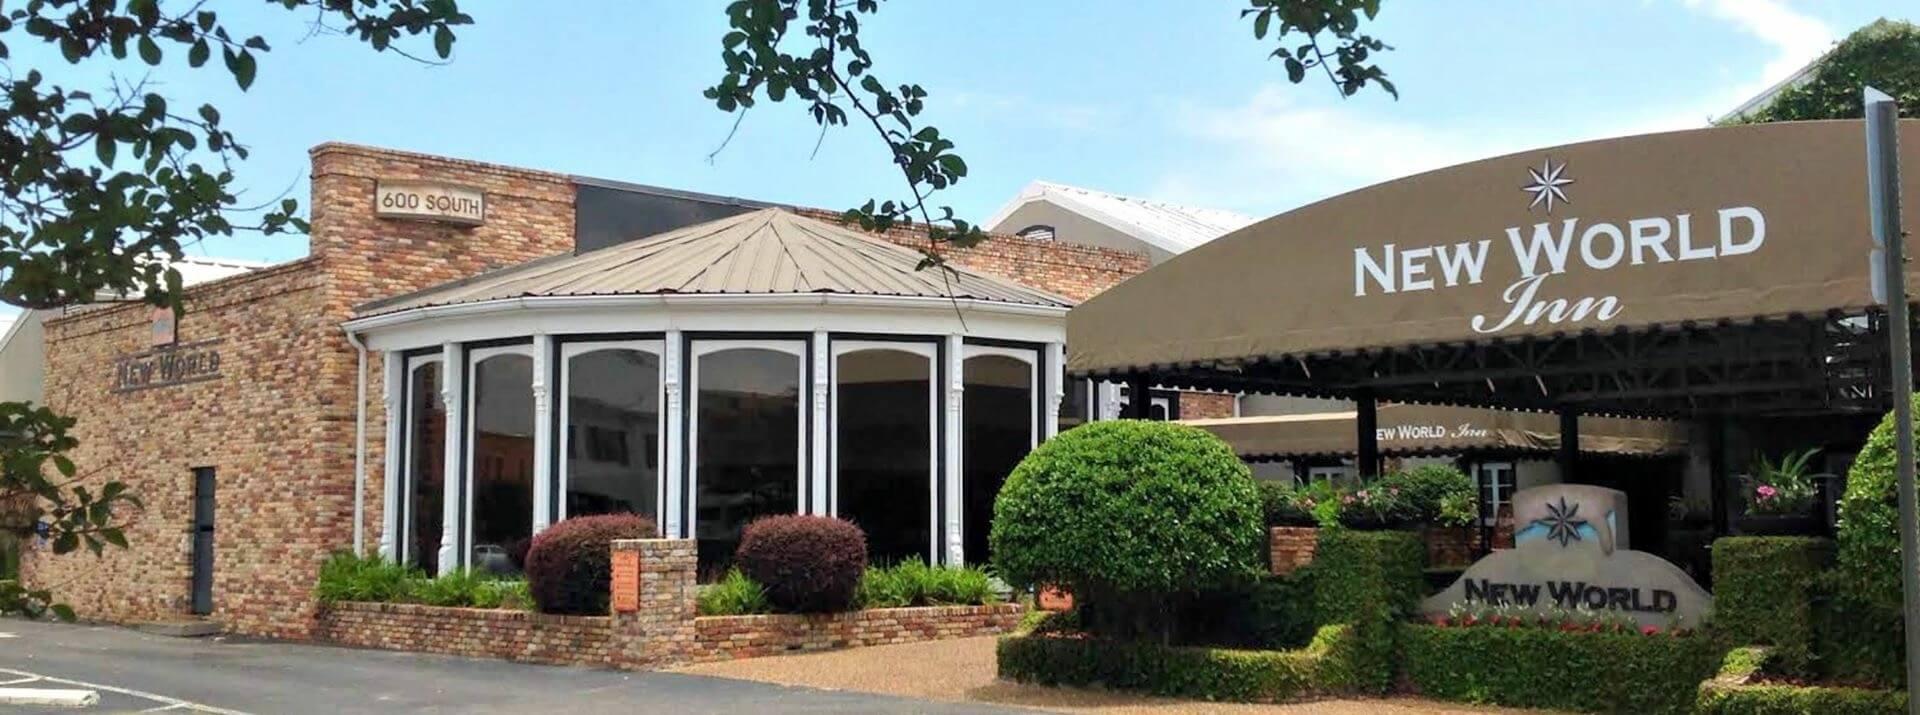 Skopelos at New World and New World Inn building